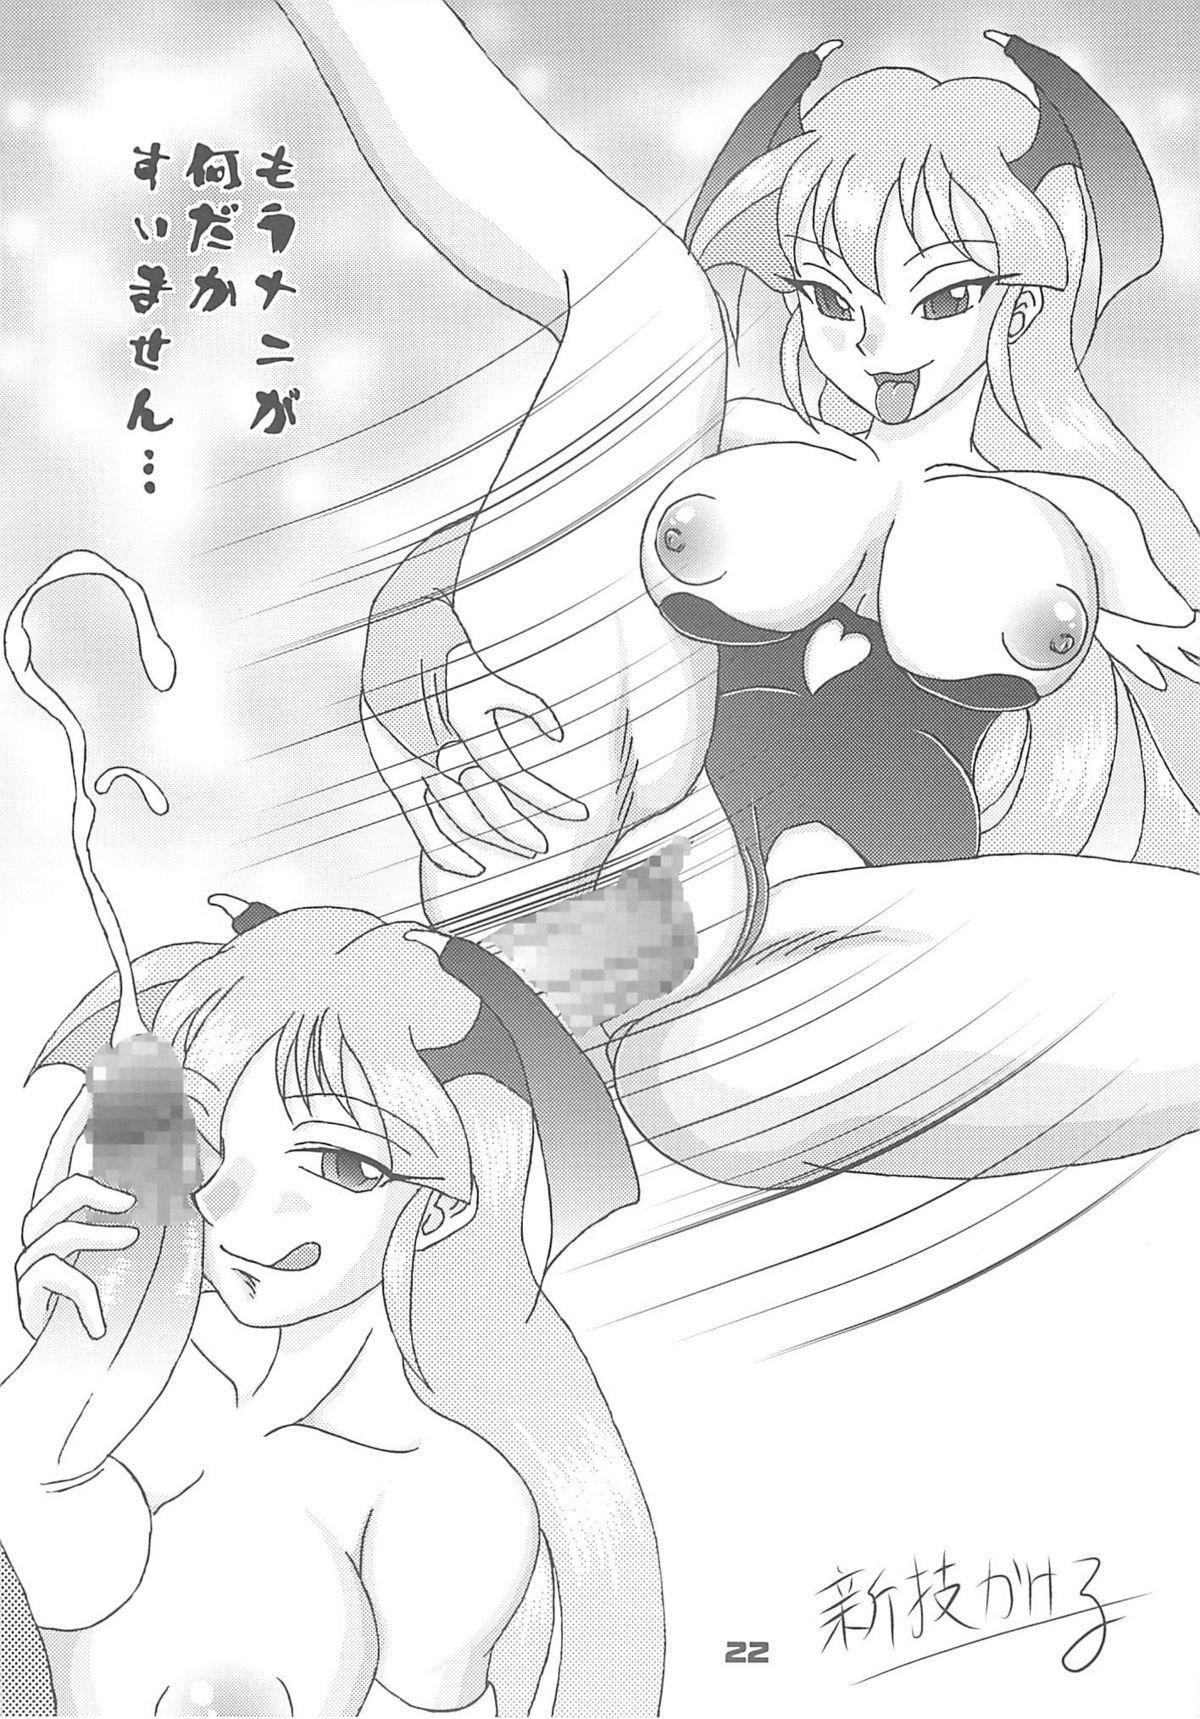 Sailor fuku to Kikai jin Koumori Oppai   Sailor Suit & Vampire Tits! 21